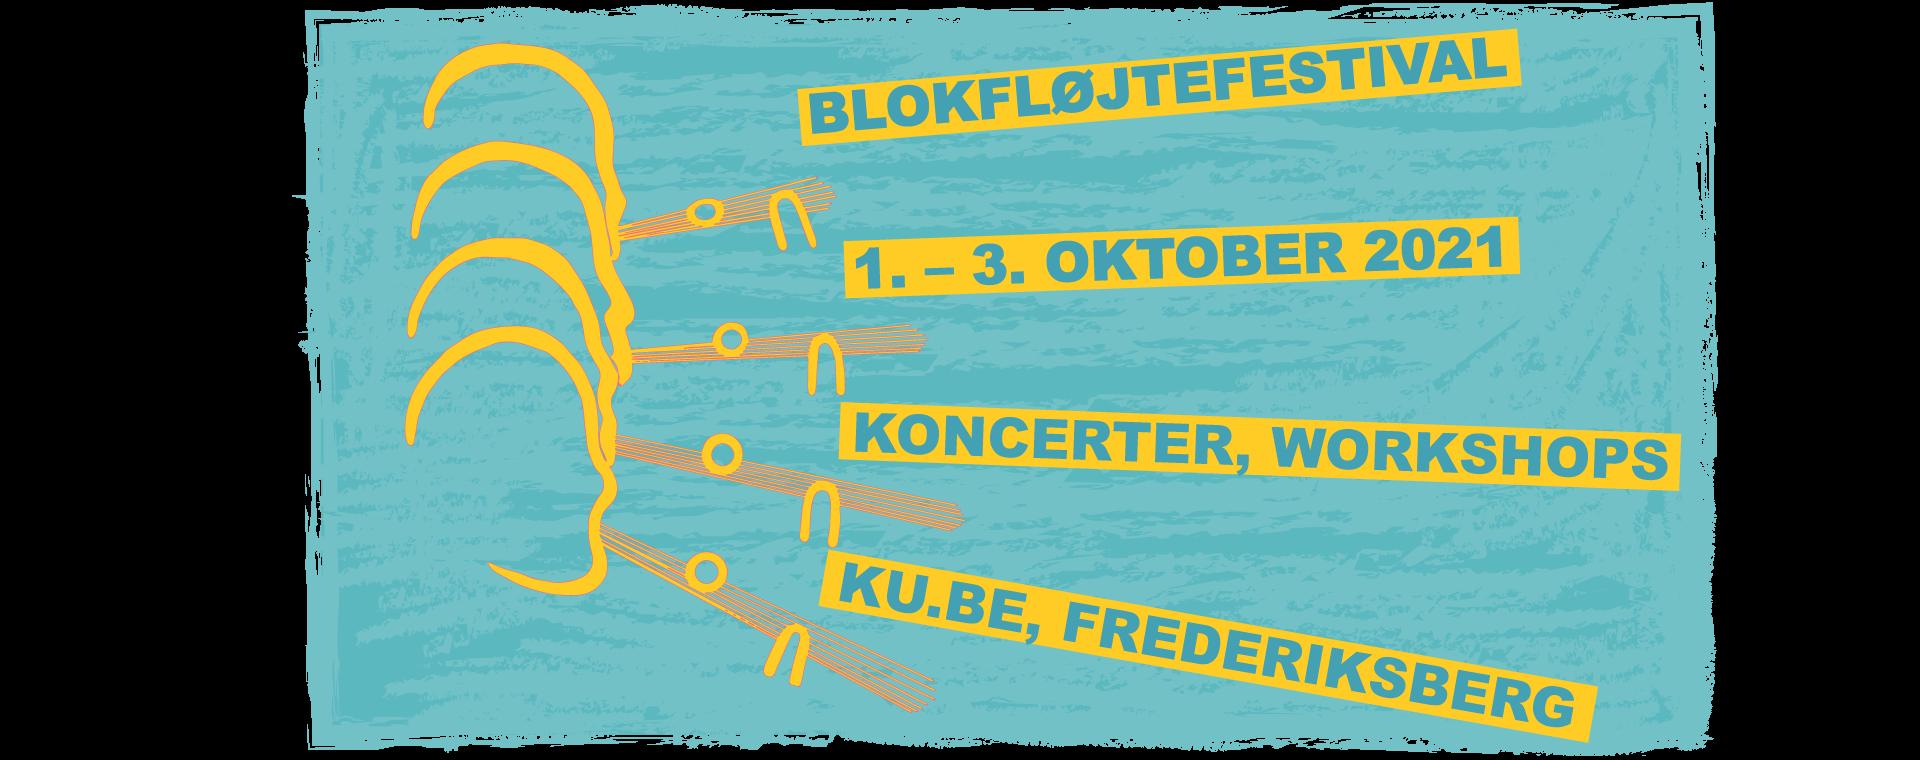 Blokfløjtefestival